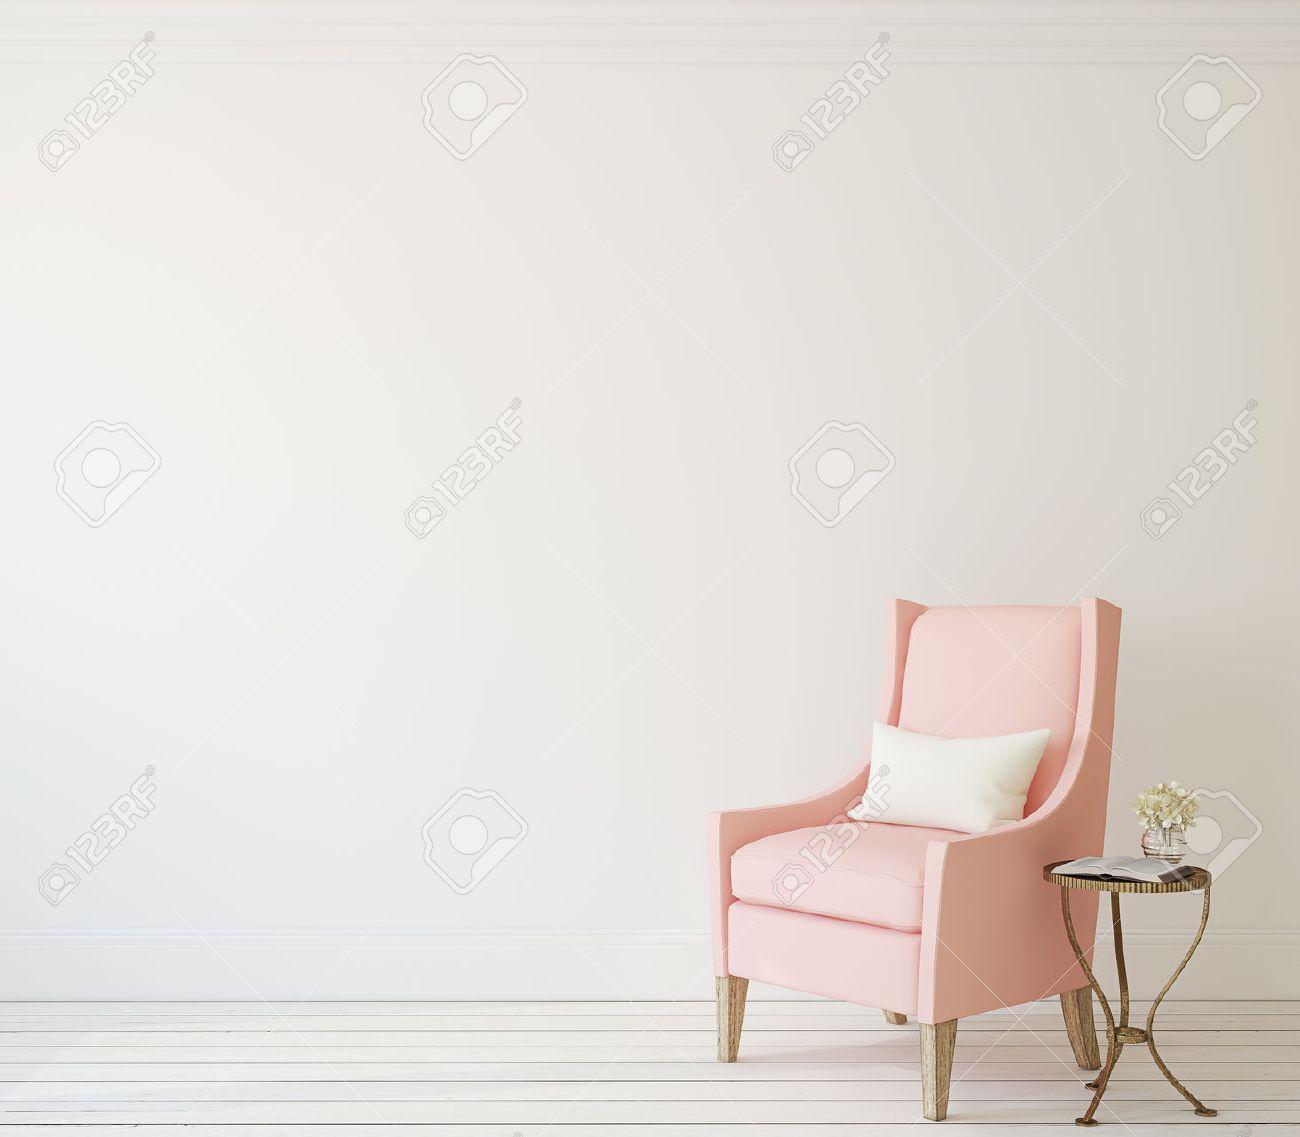 Beige modern armchair - Modern Armchair Interior With Pink Armchair Near White Wall 3d Render Stock Photo